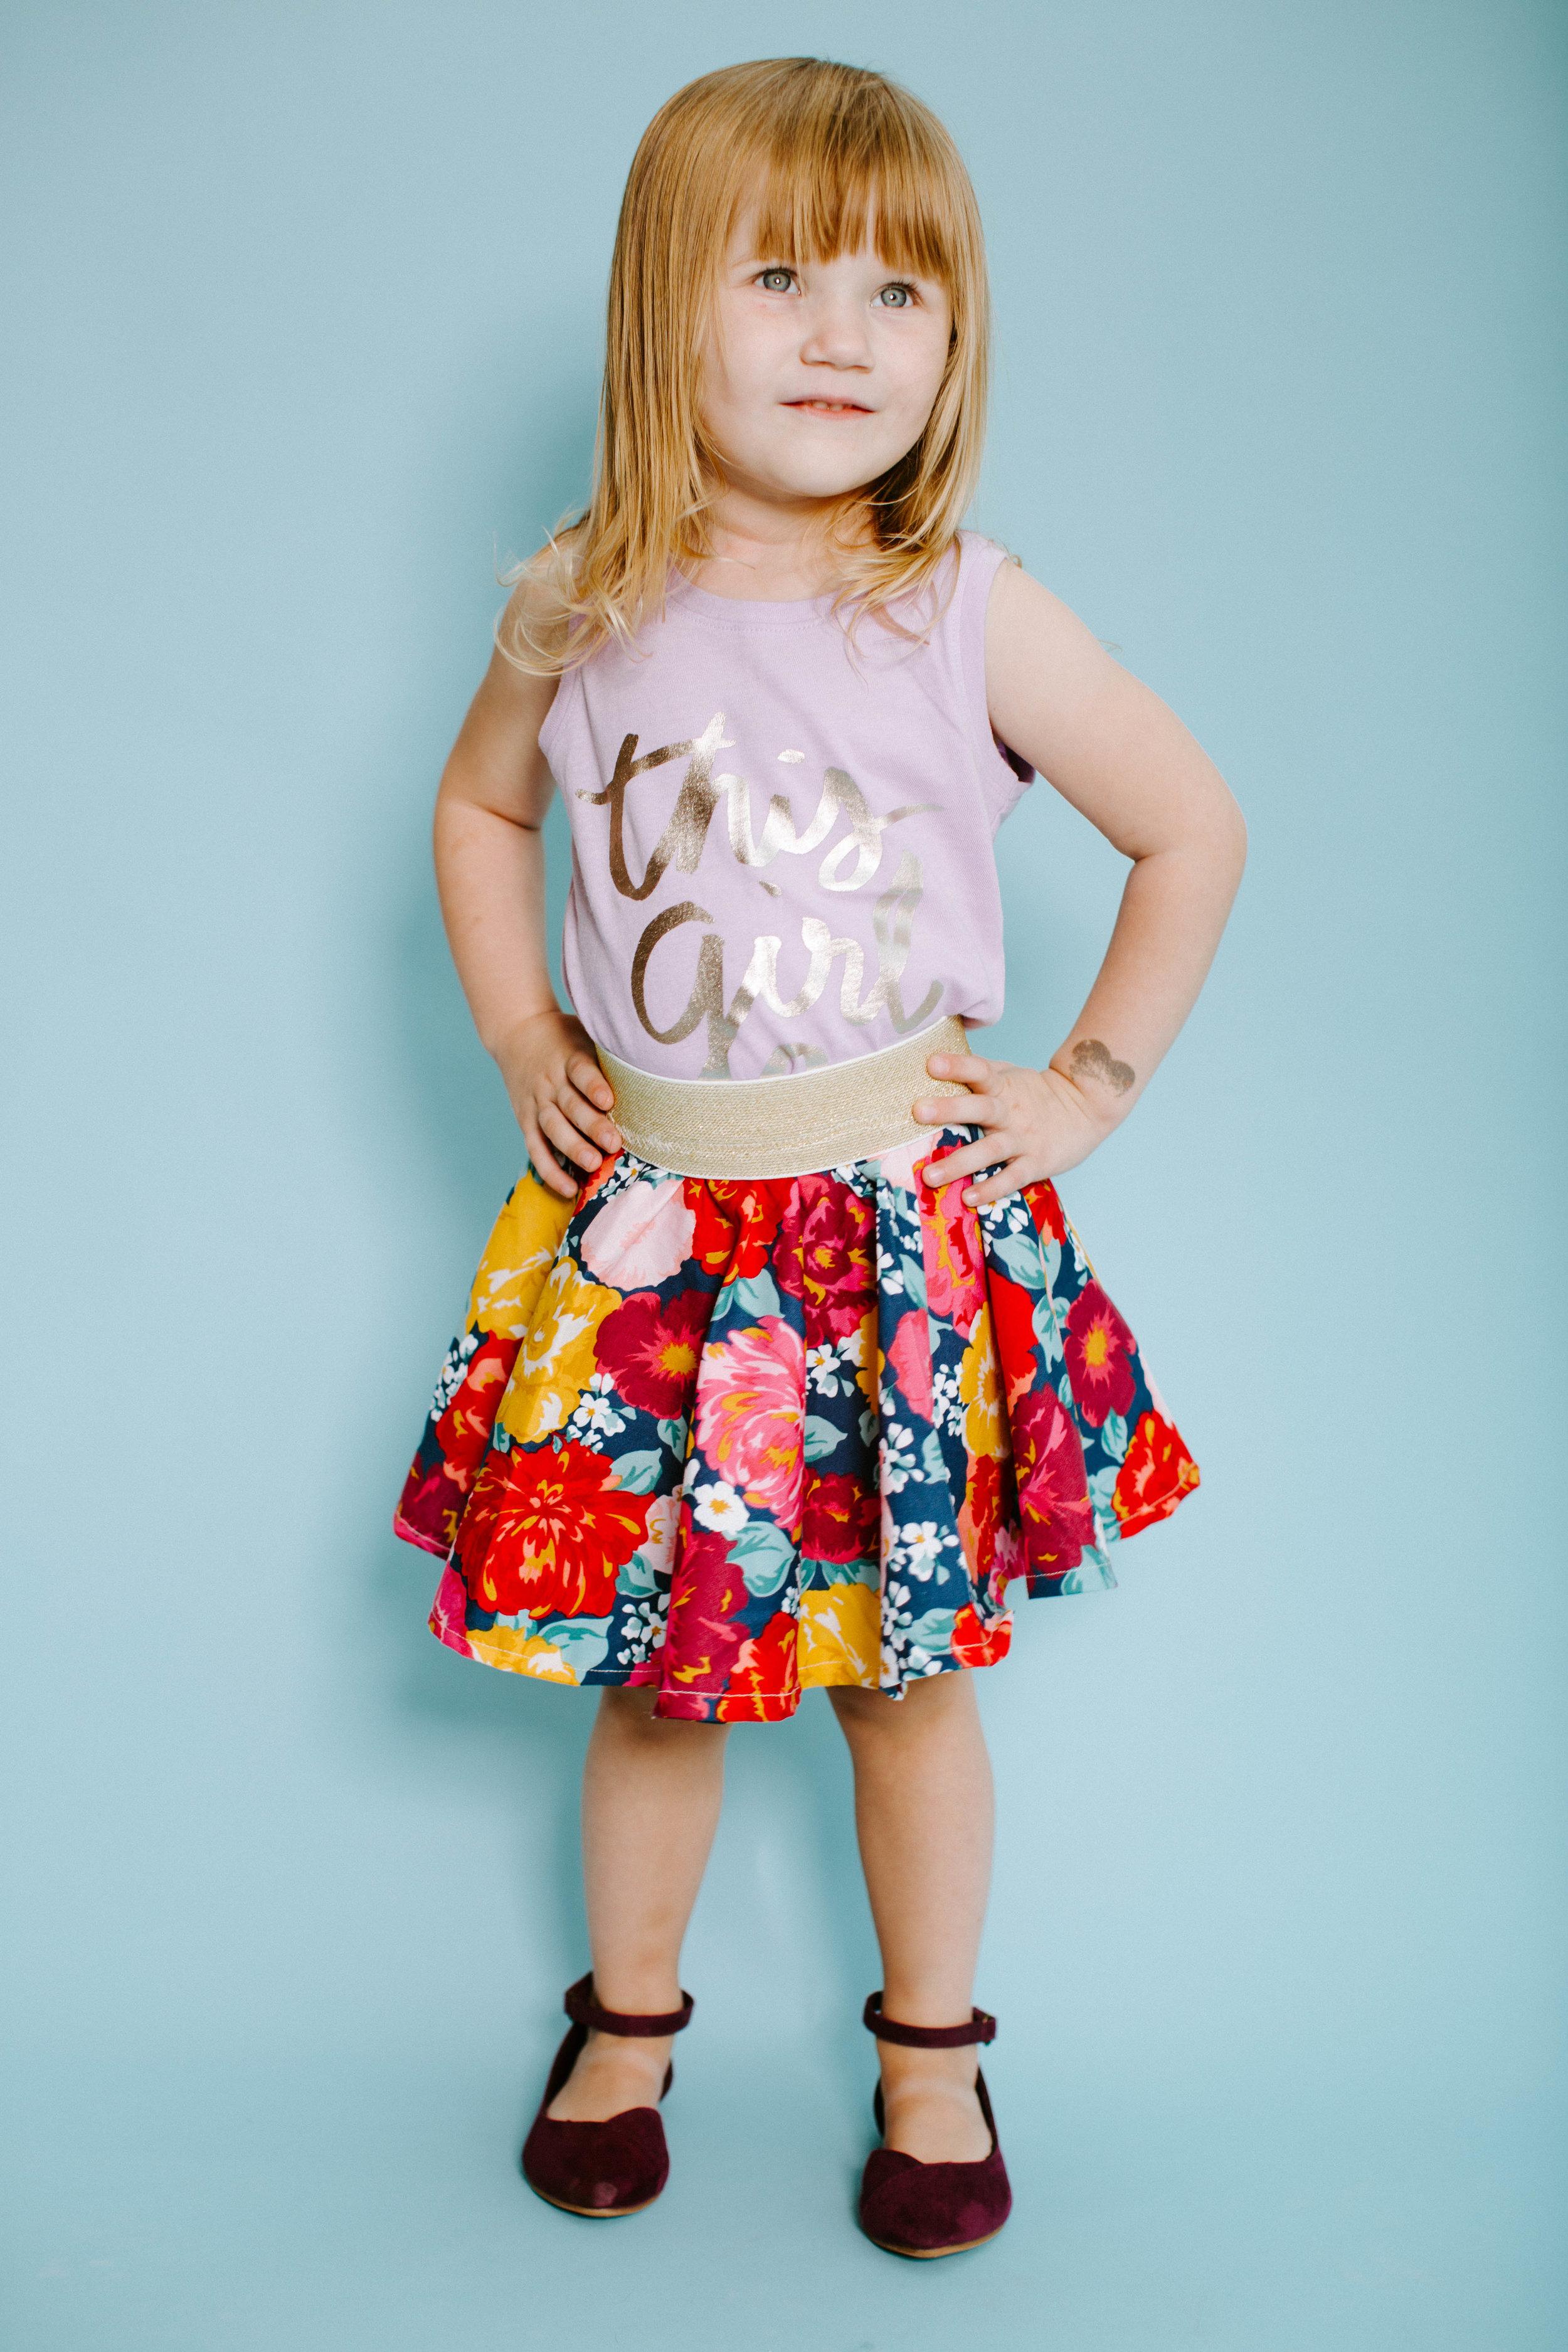 margeaux-floral-skirt-9057.jpg